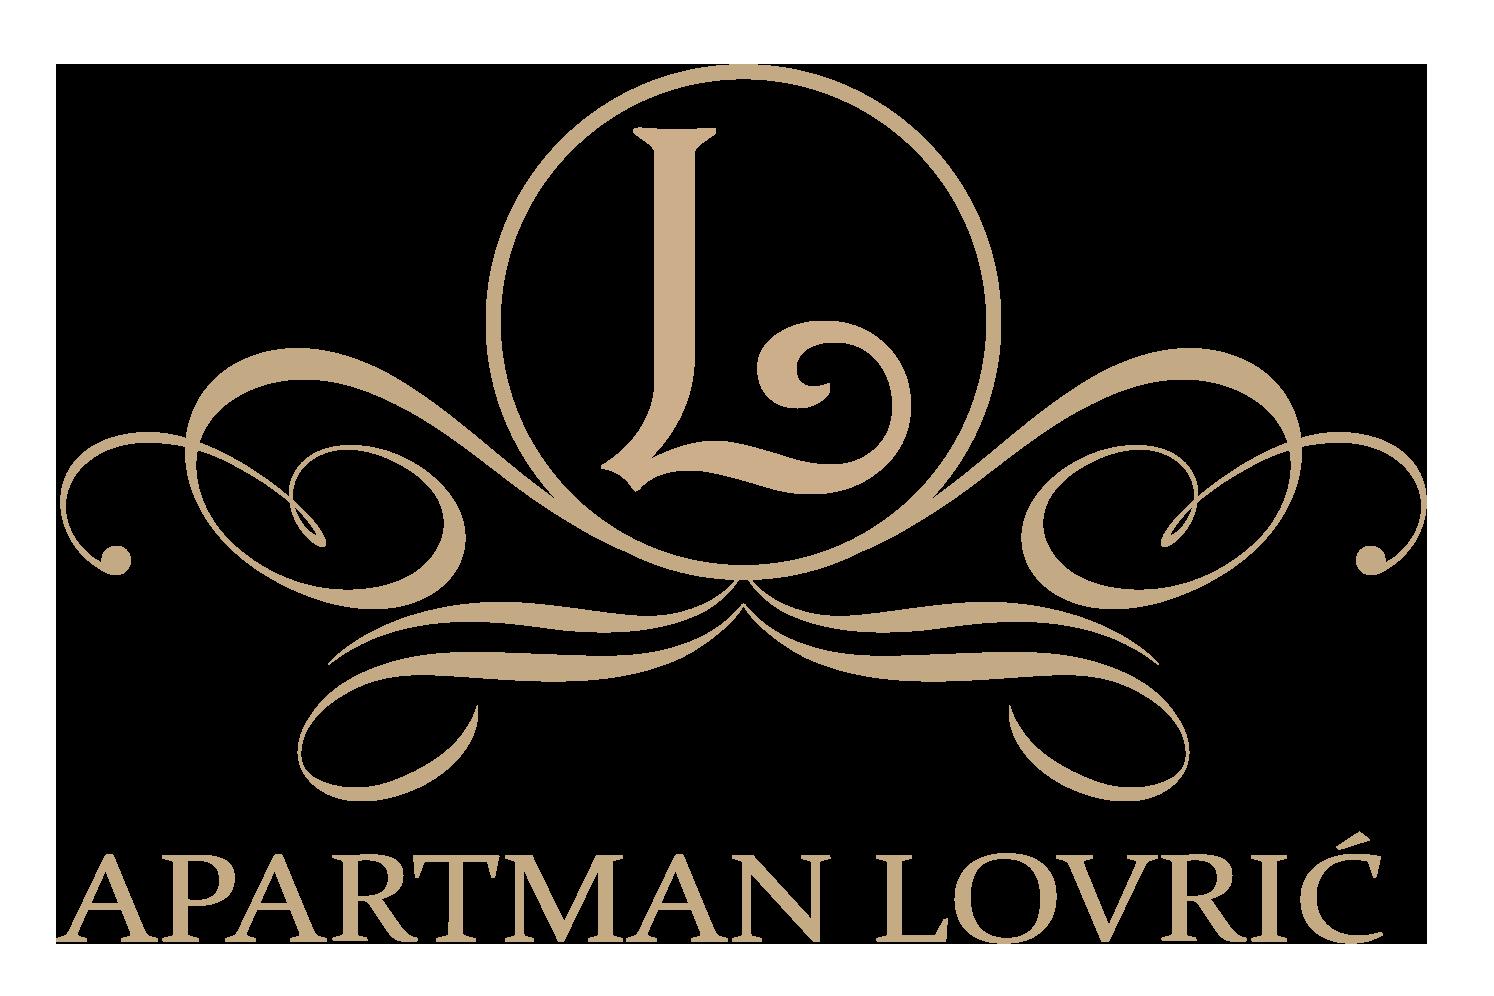 Apartman Lovric